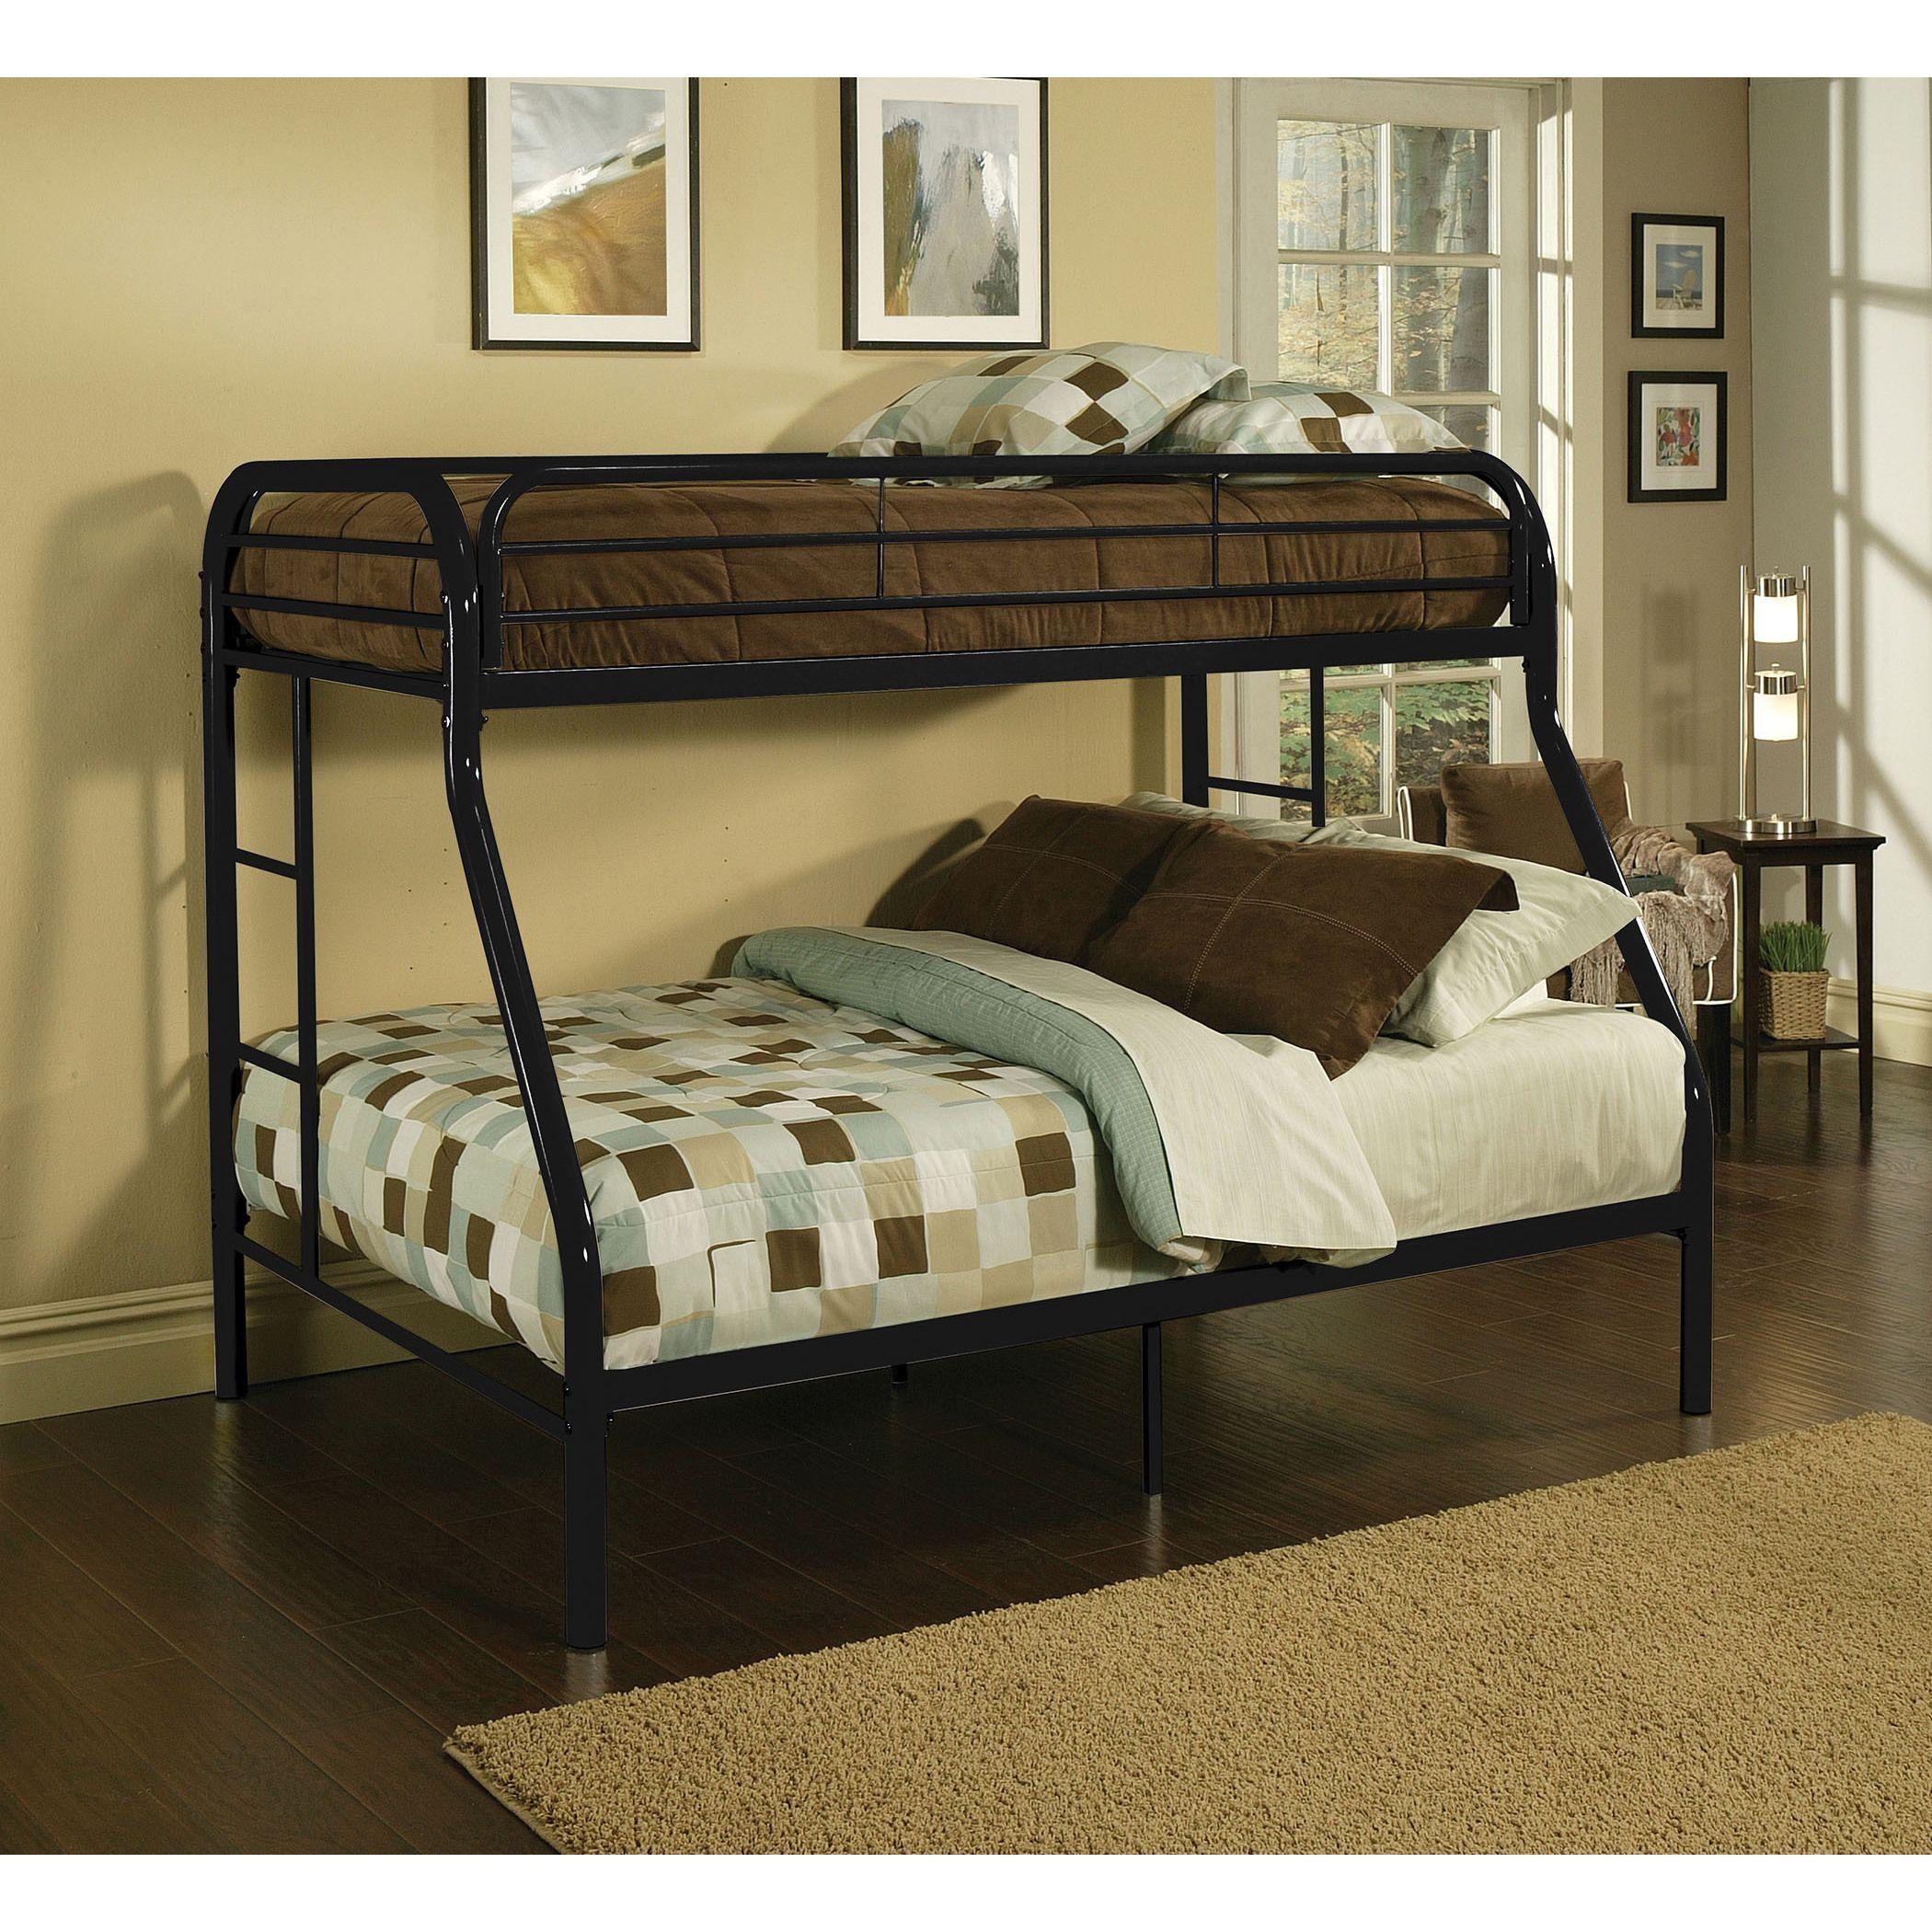 Tritan Black Metal Twin Xl Queen Bunk Bed Black 84l X 62 W X 65 H